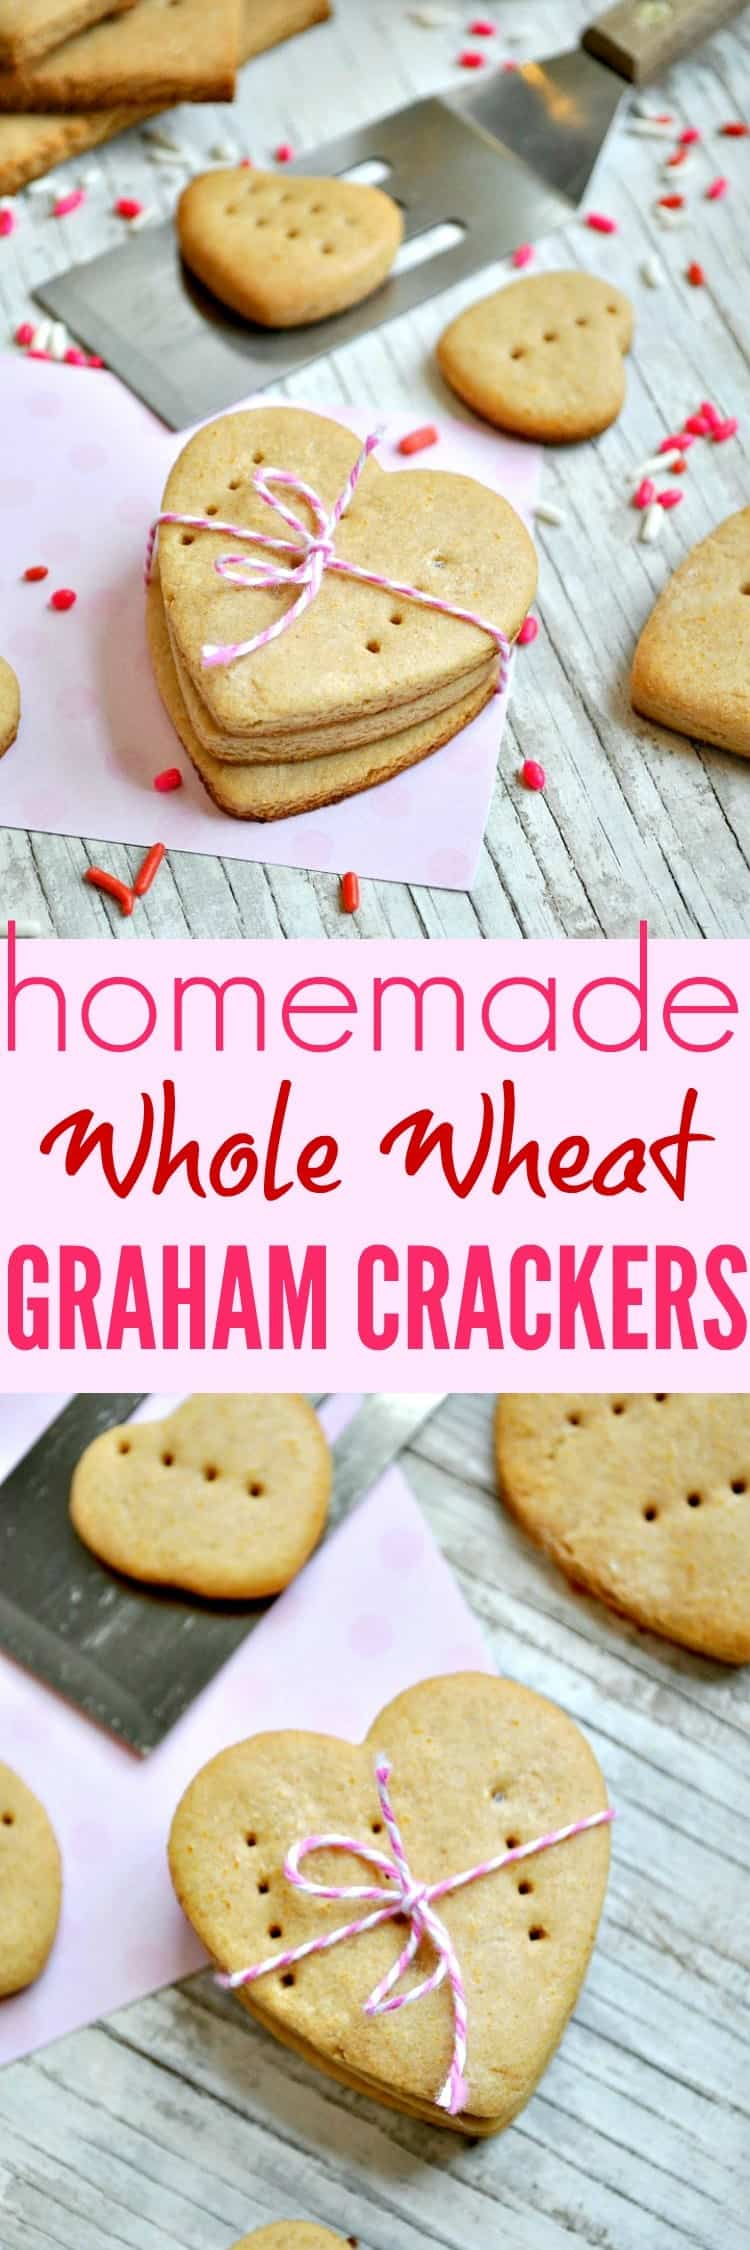 Homemade Whole Wheat Graham Crackers